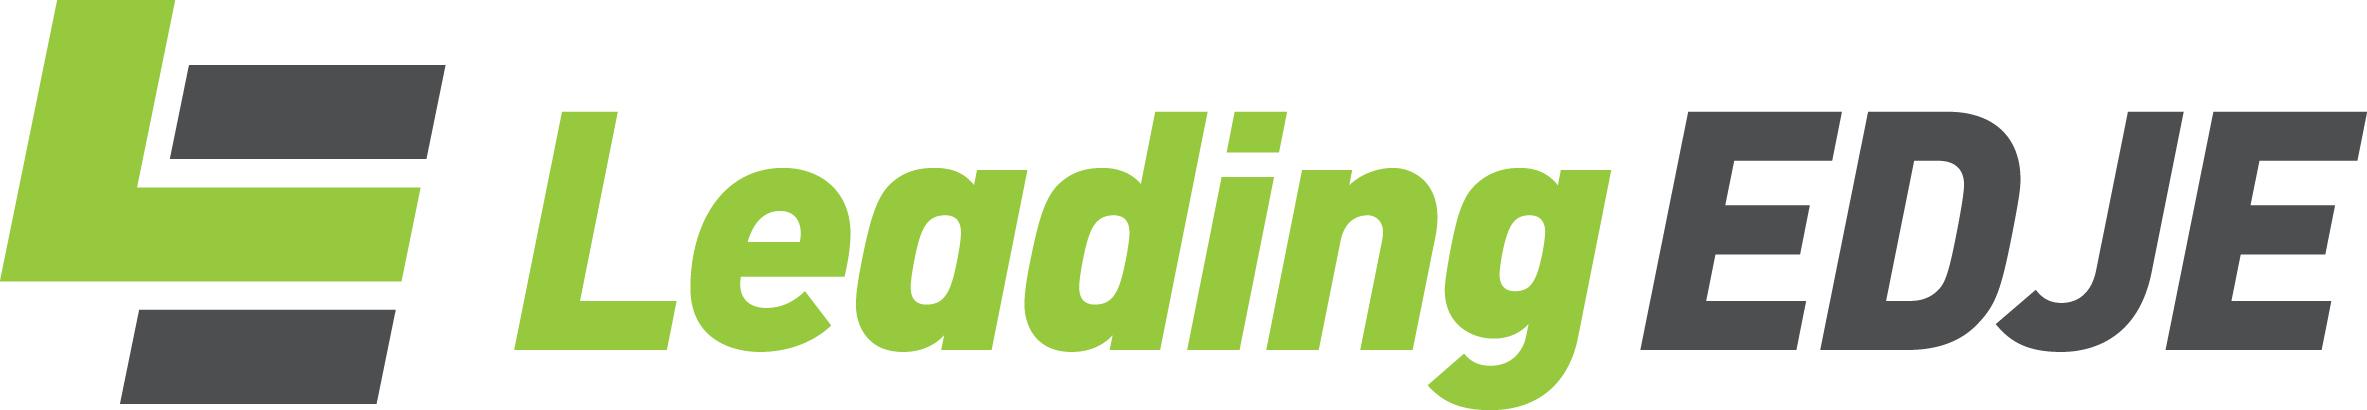 Leading EDJE LLC logo